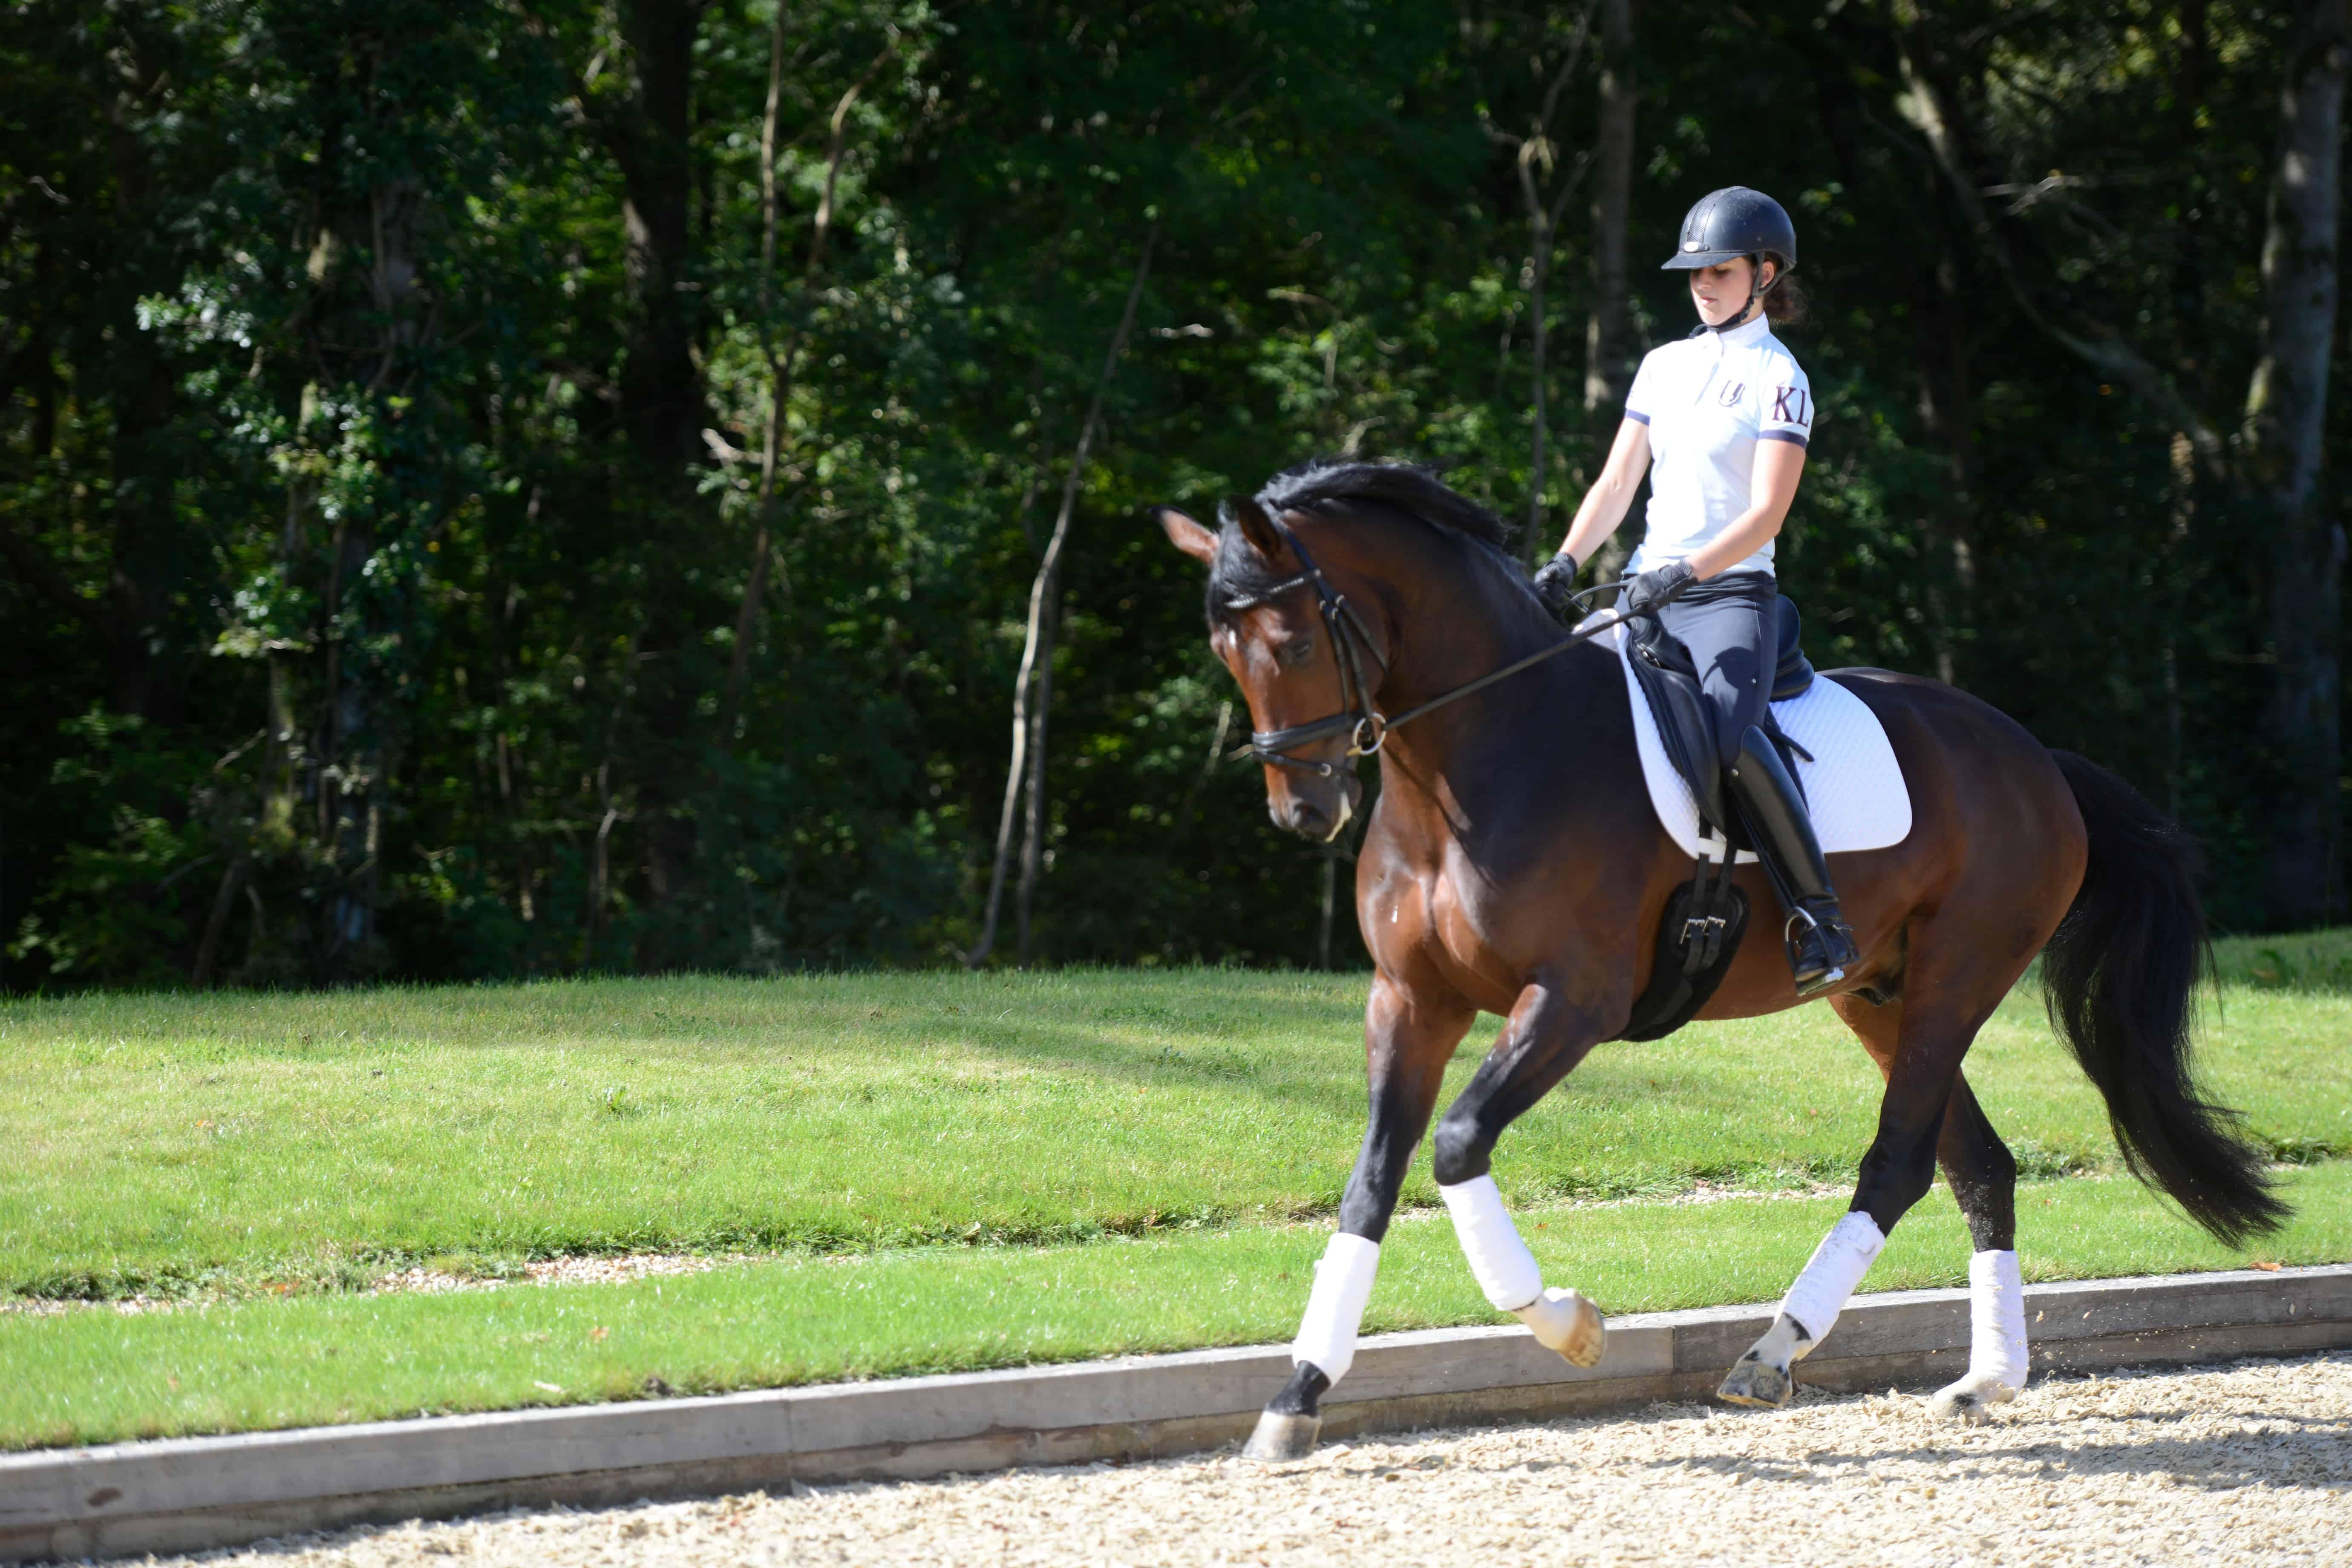 Free equestrian dating uk